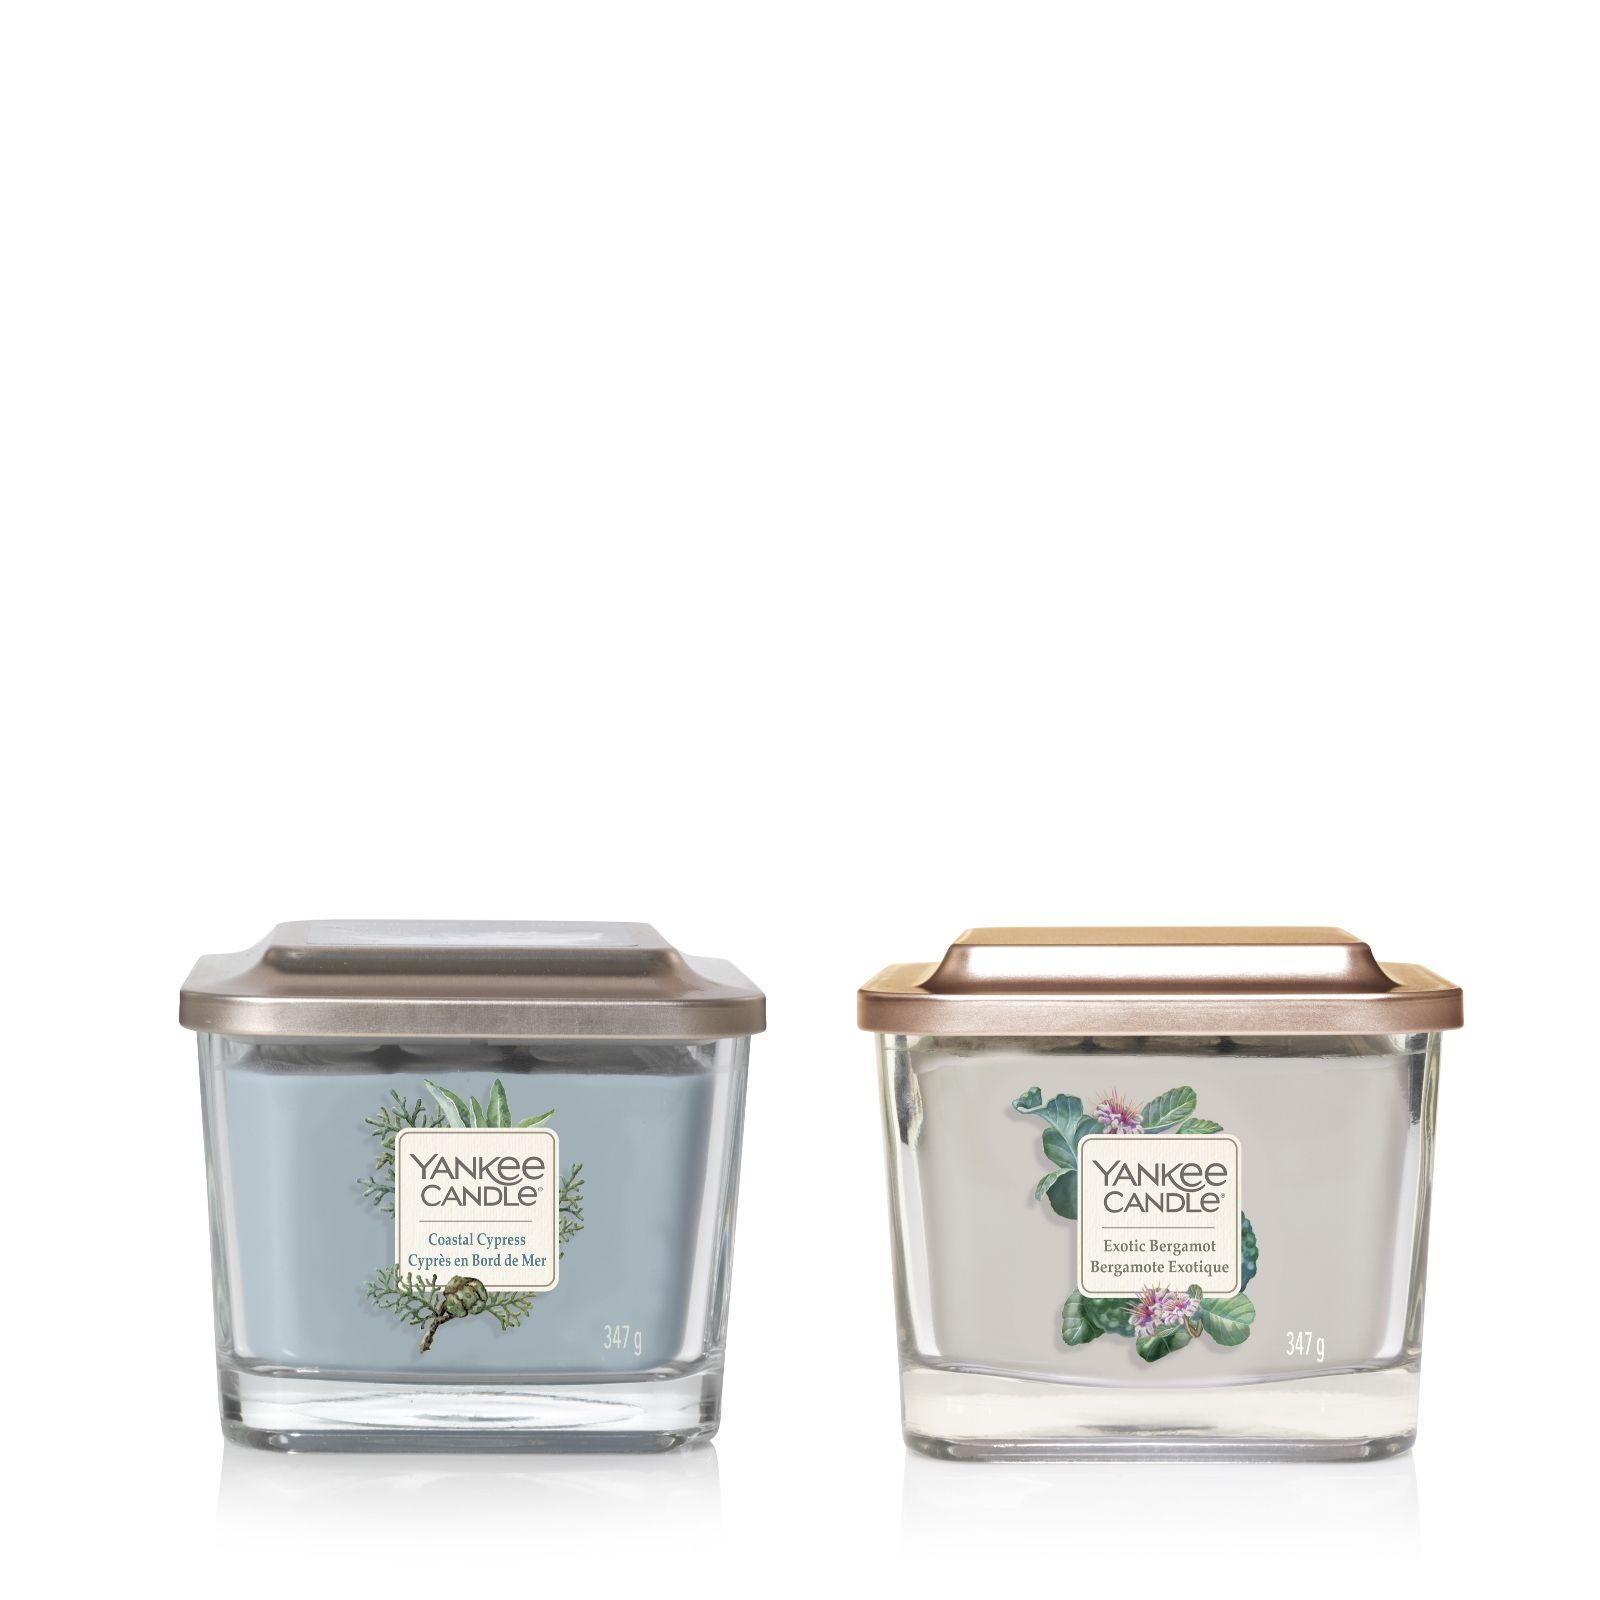 Yankee Candle Set of 2 Elevate Medium Jars - QVC UK